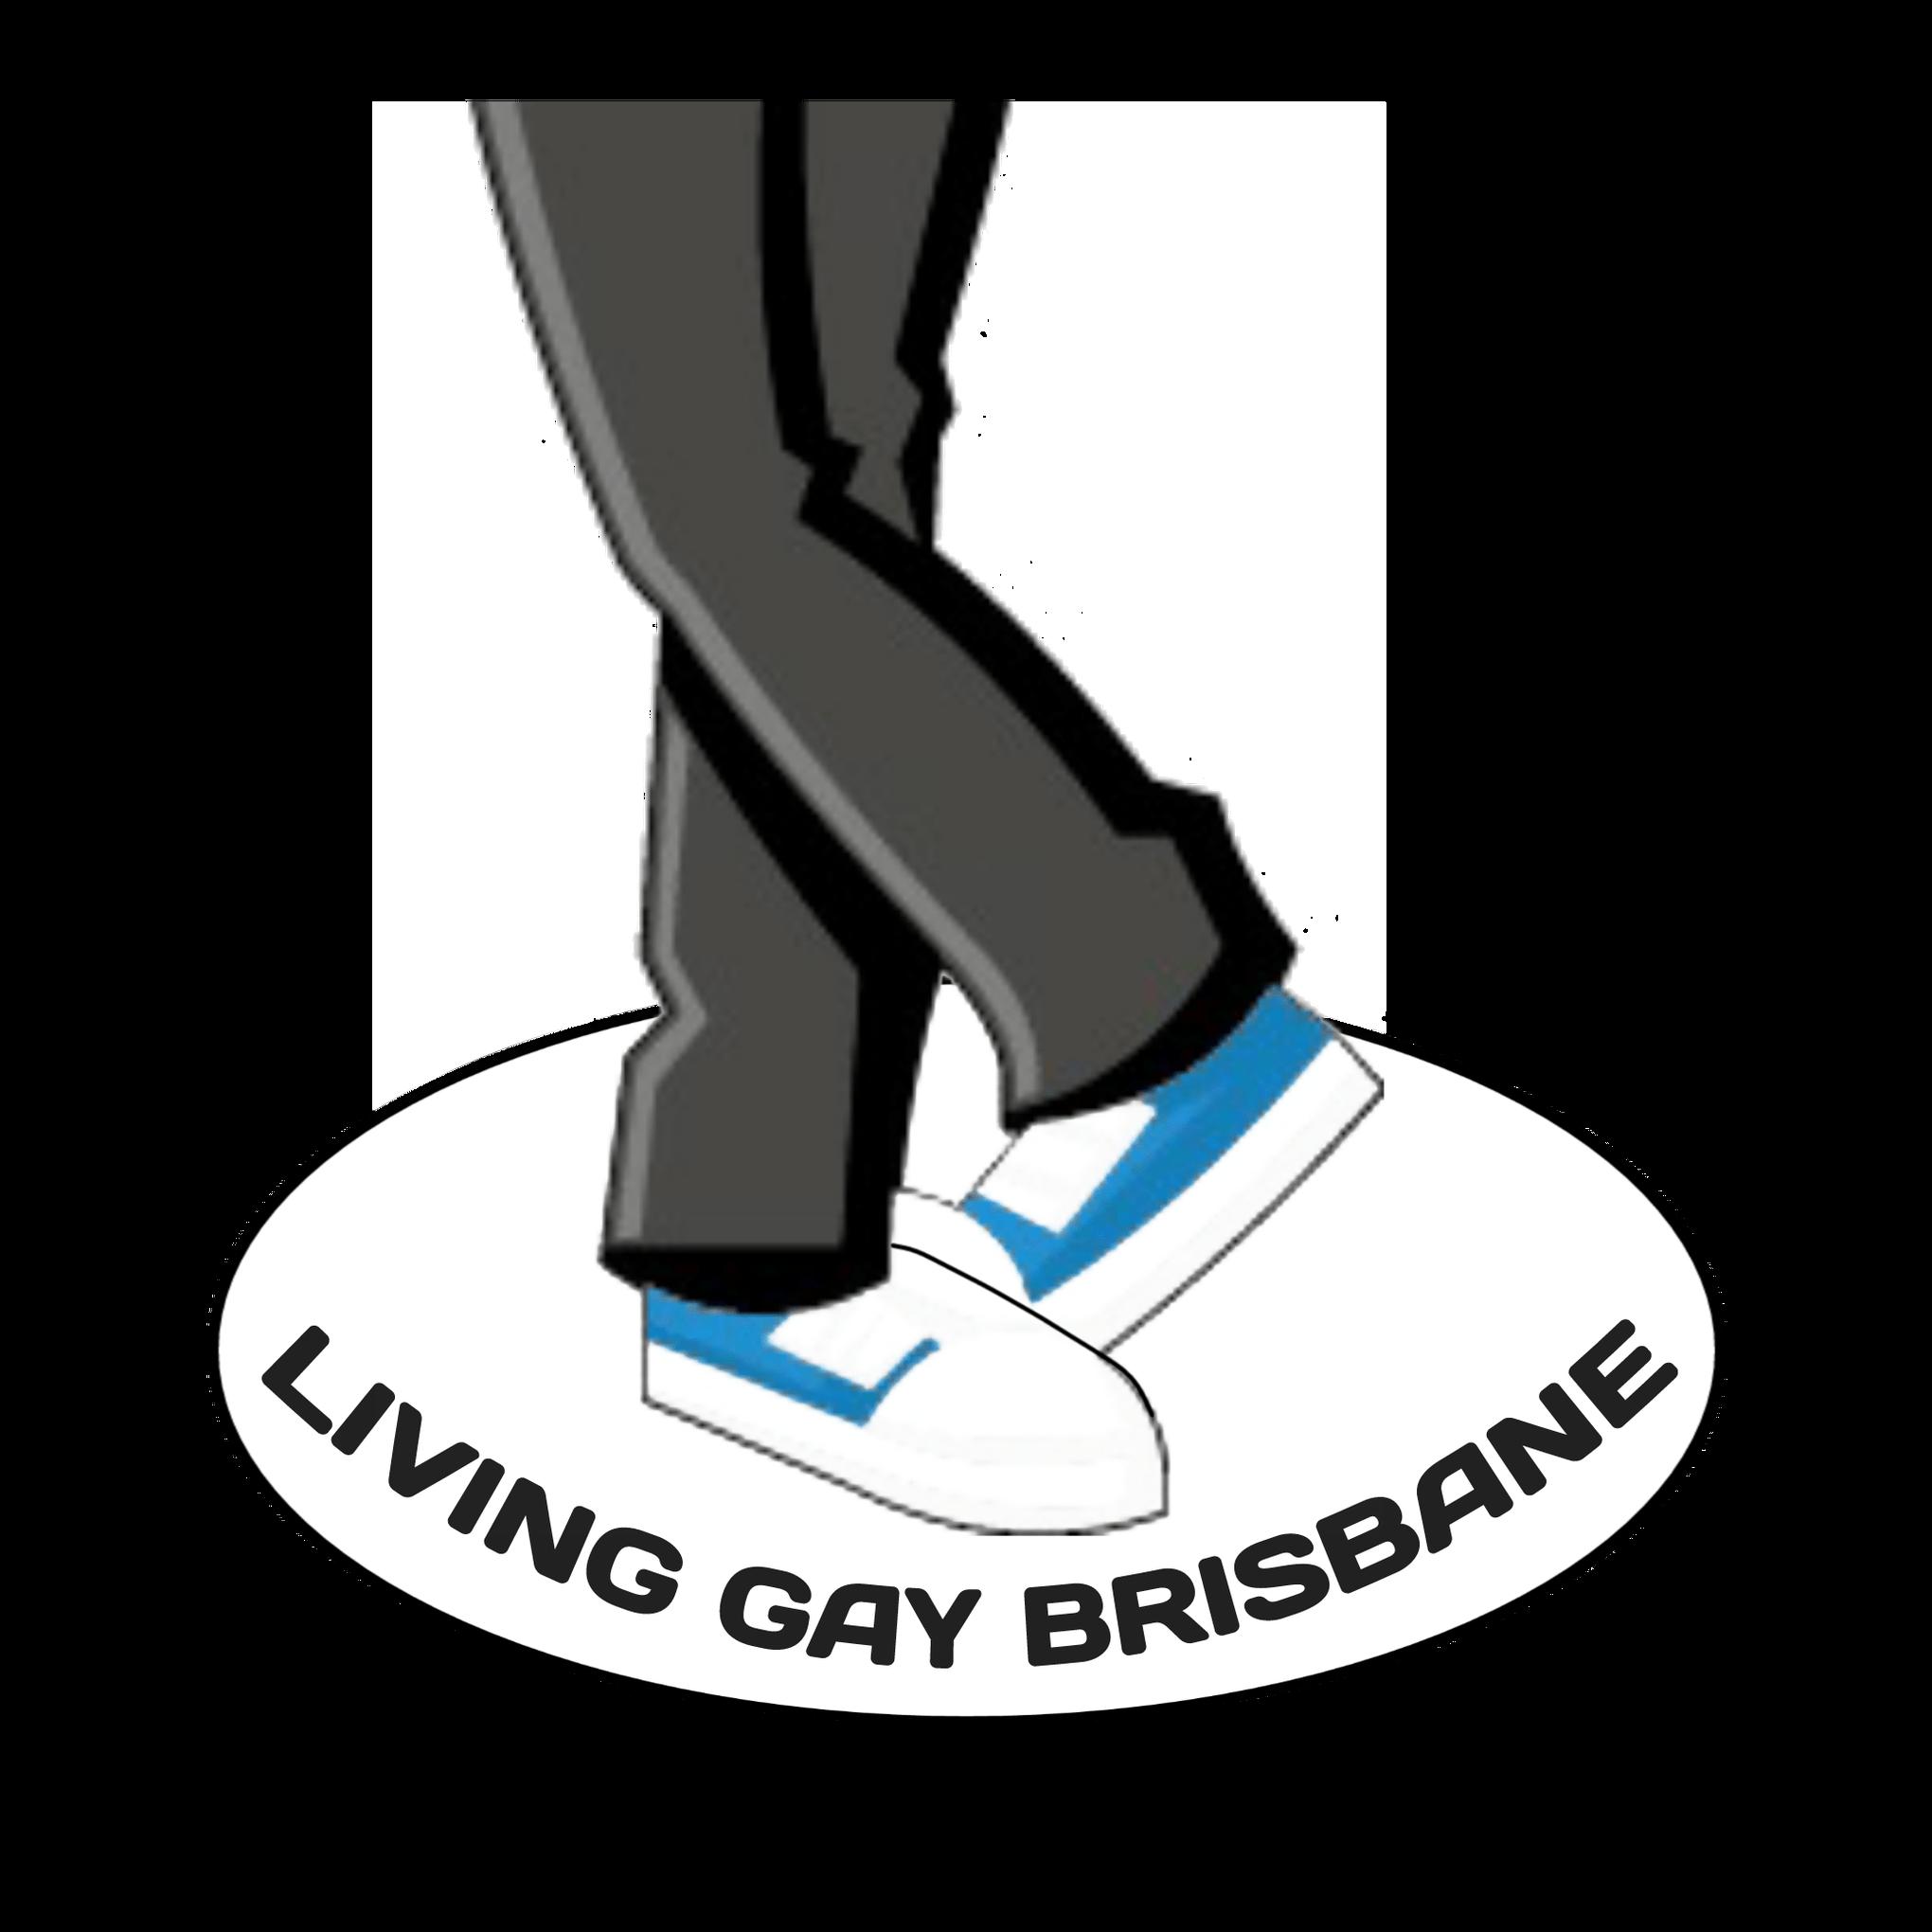 Gratuit Gay Dating dans Brisbane